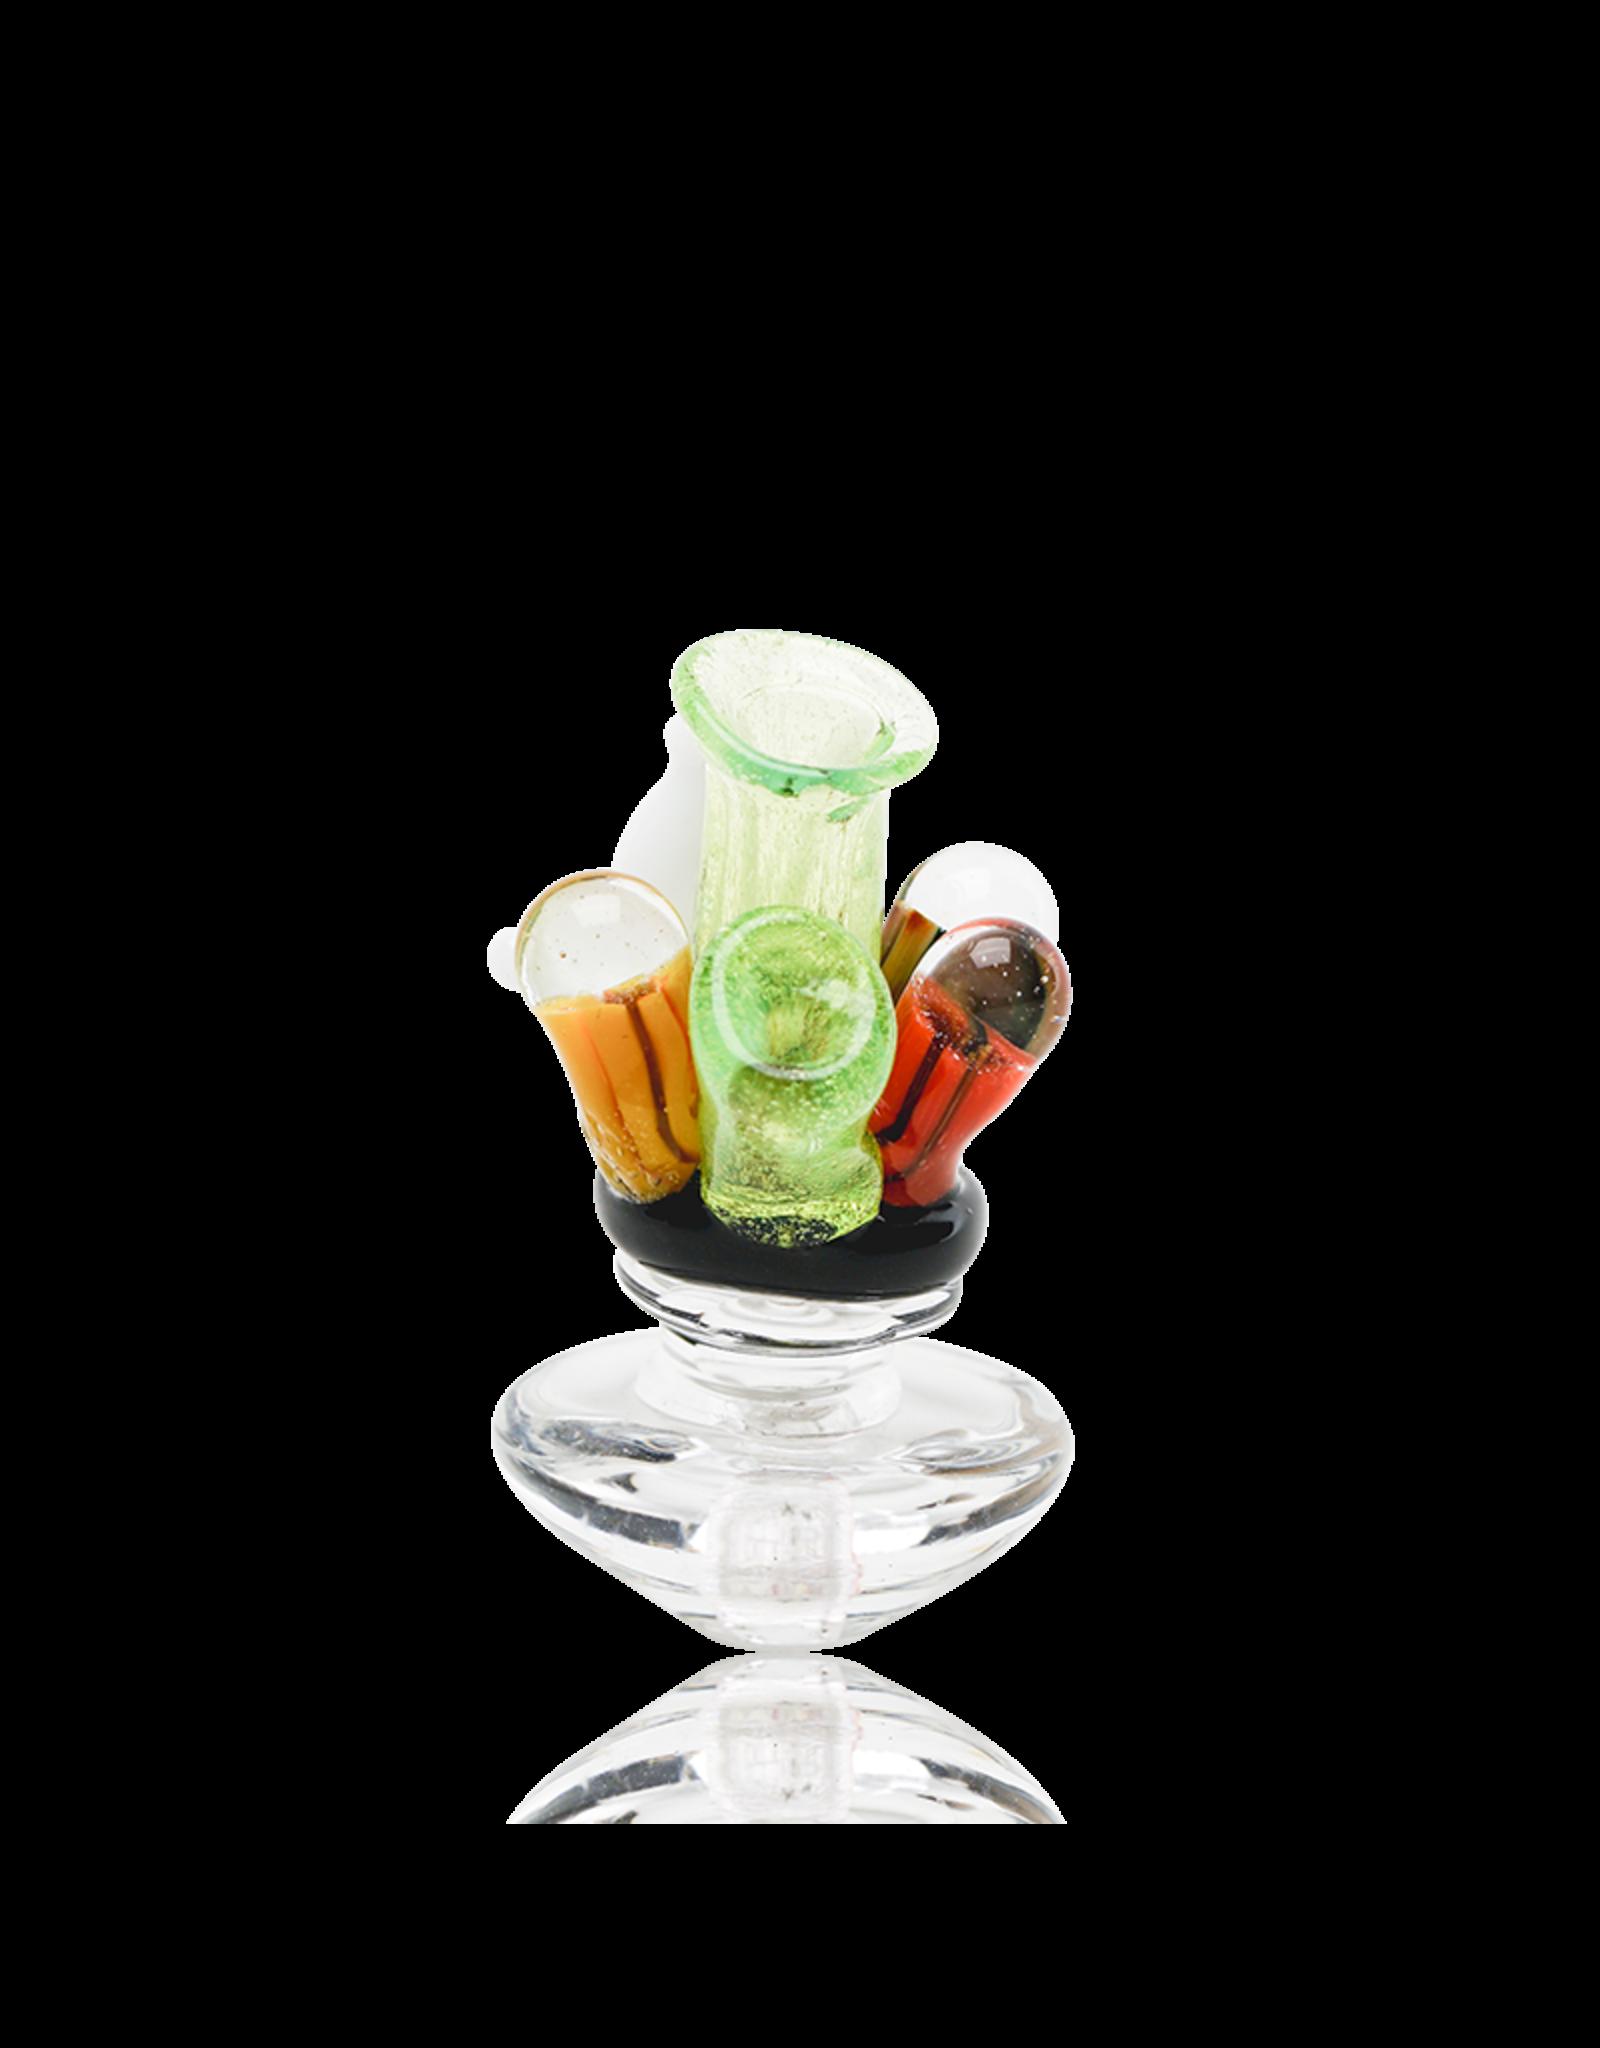 Empire Glass Coral Reef Peak Carb Cap